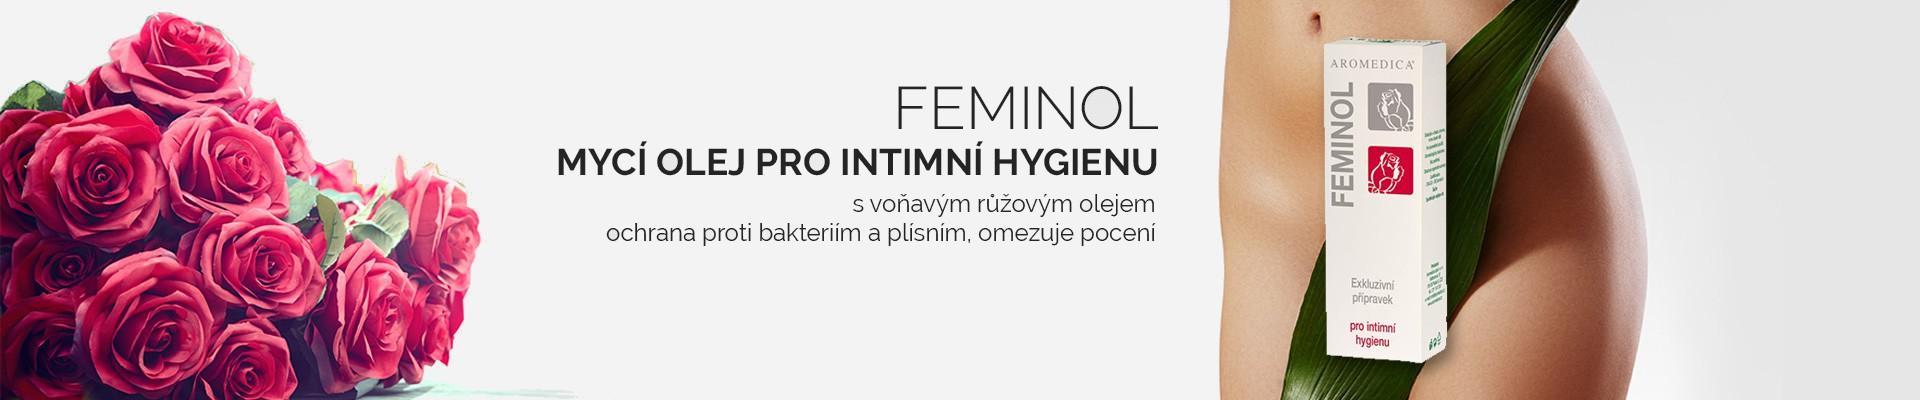 Feminol